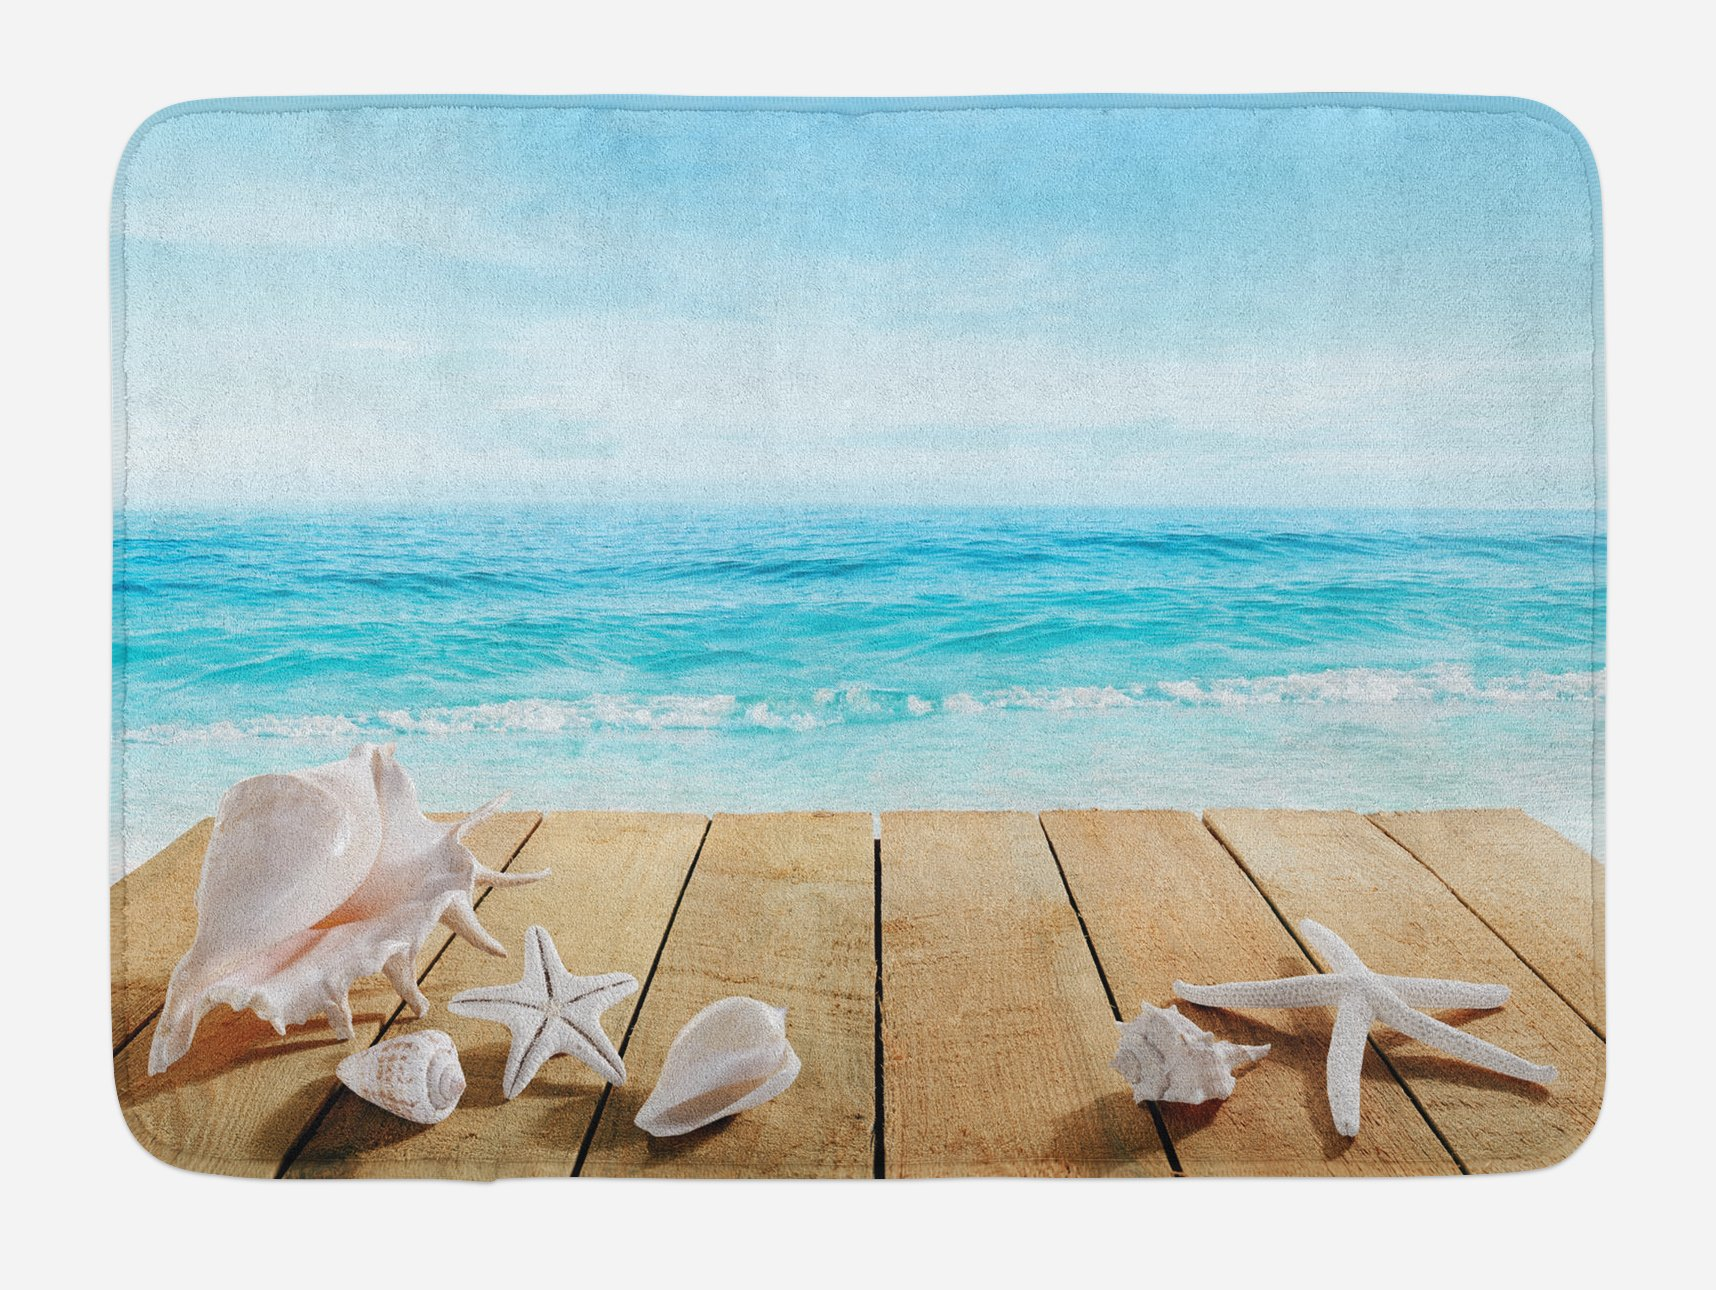 Ambesonne Seashells Bath Mat, Wooden Boardwald with Seashells Sunshine Vacations Beach Theme, Plush Bathroom Decor Mat with Non Slip Backing, 29.5 W X 17.5 W Inches, Sand BrownPale Brown Beige